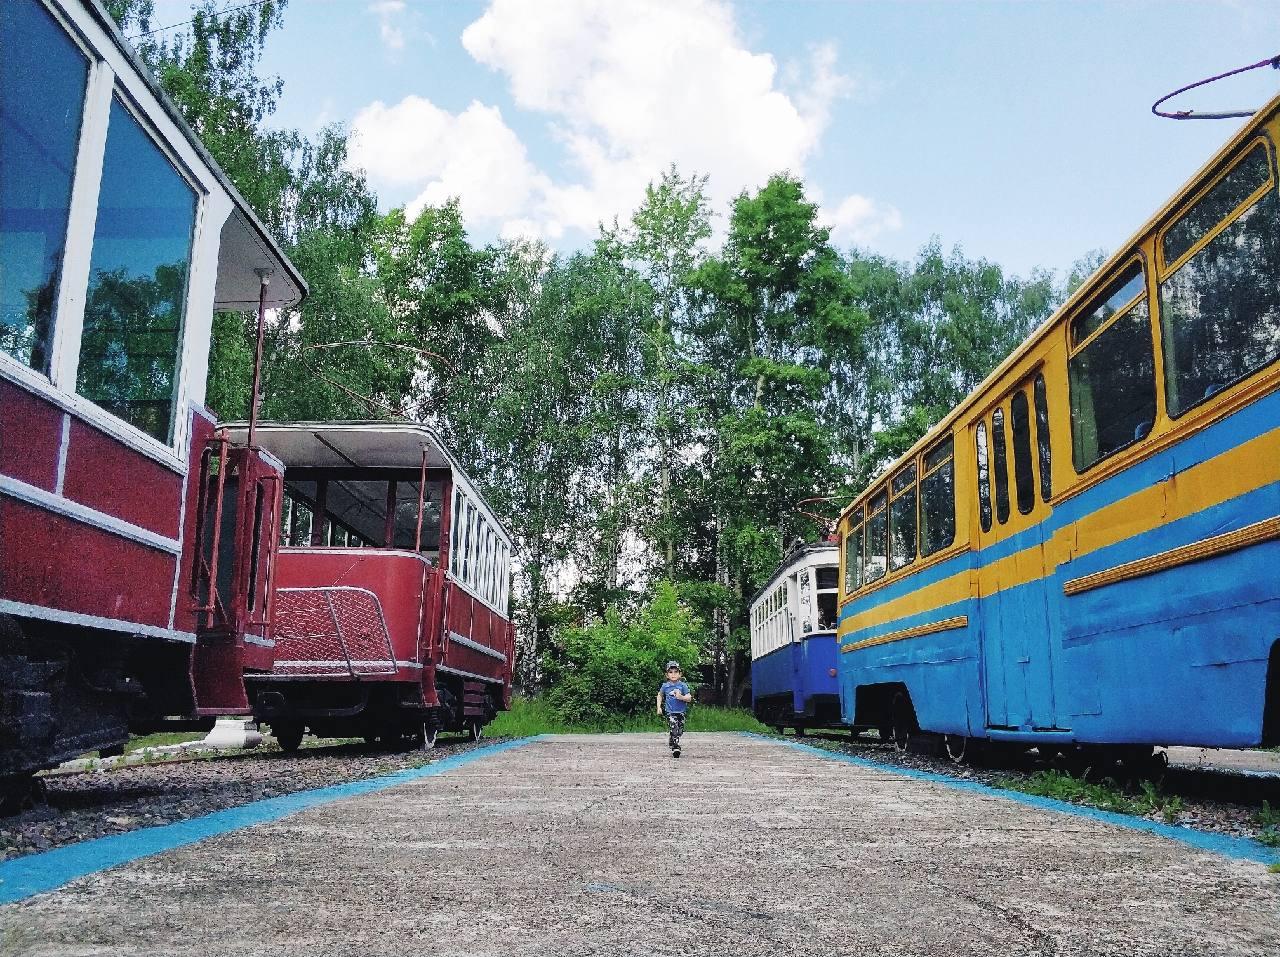 Музей трамваев в Нижнем Новгороде